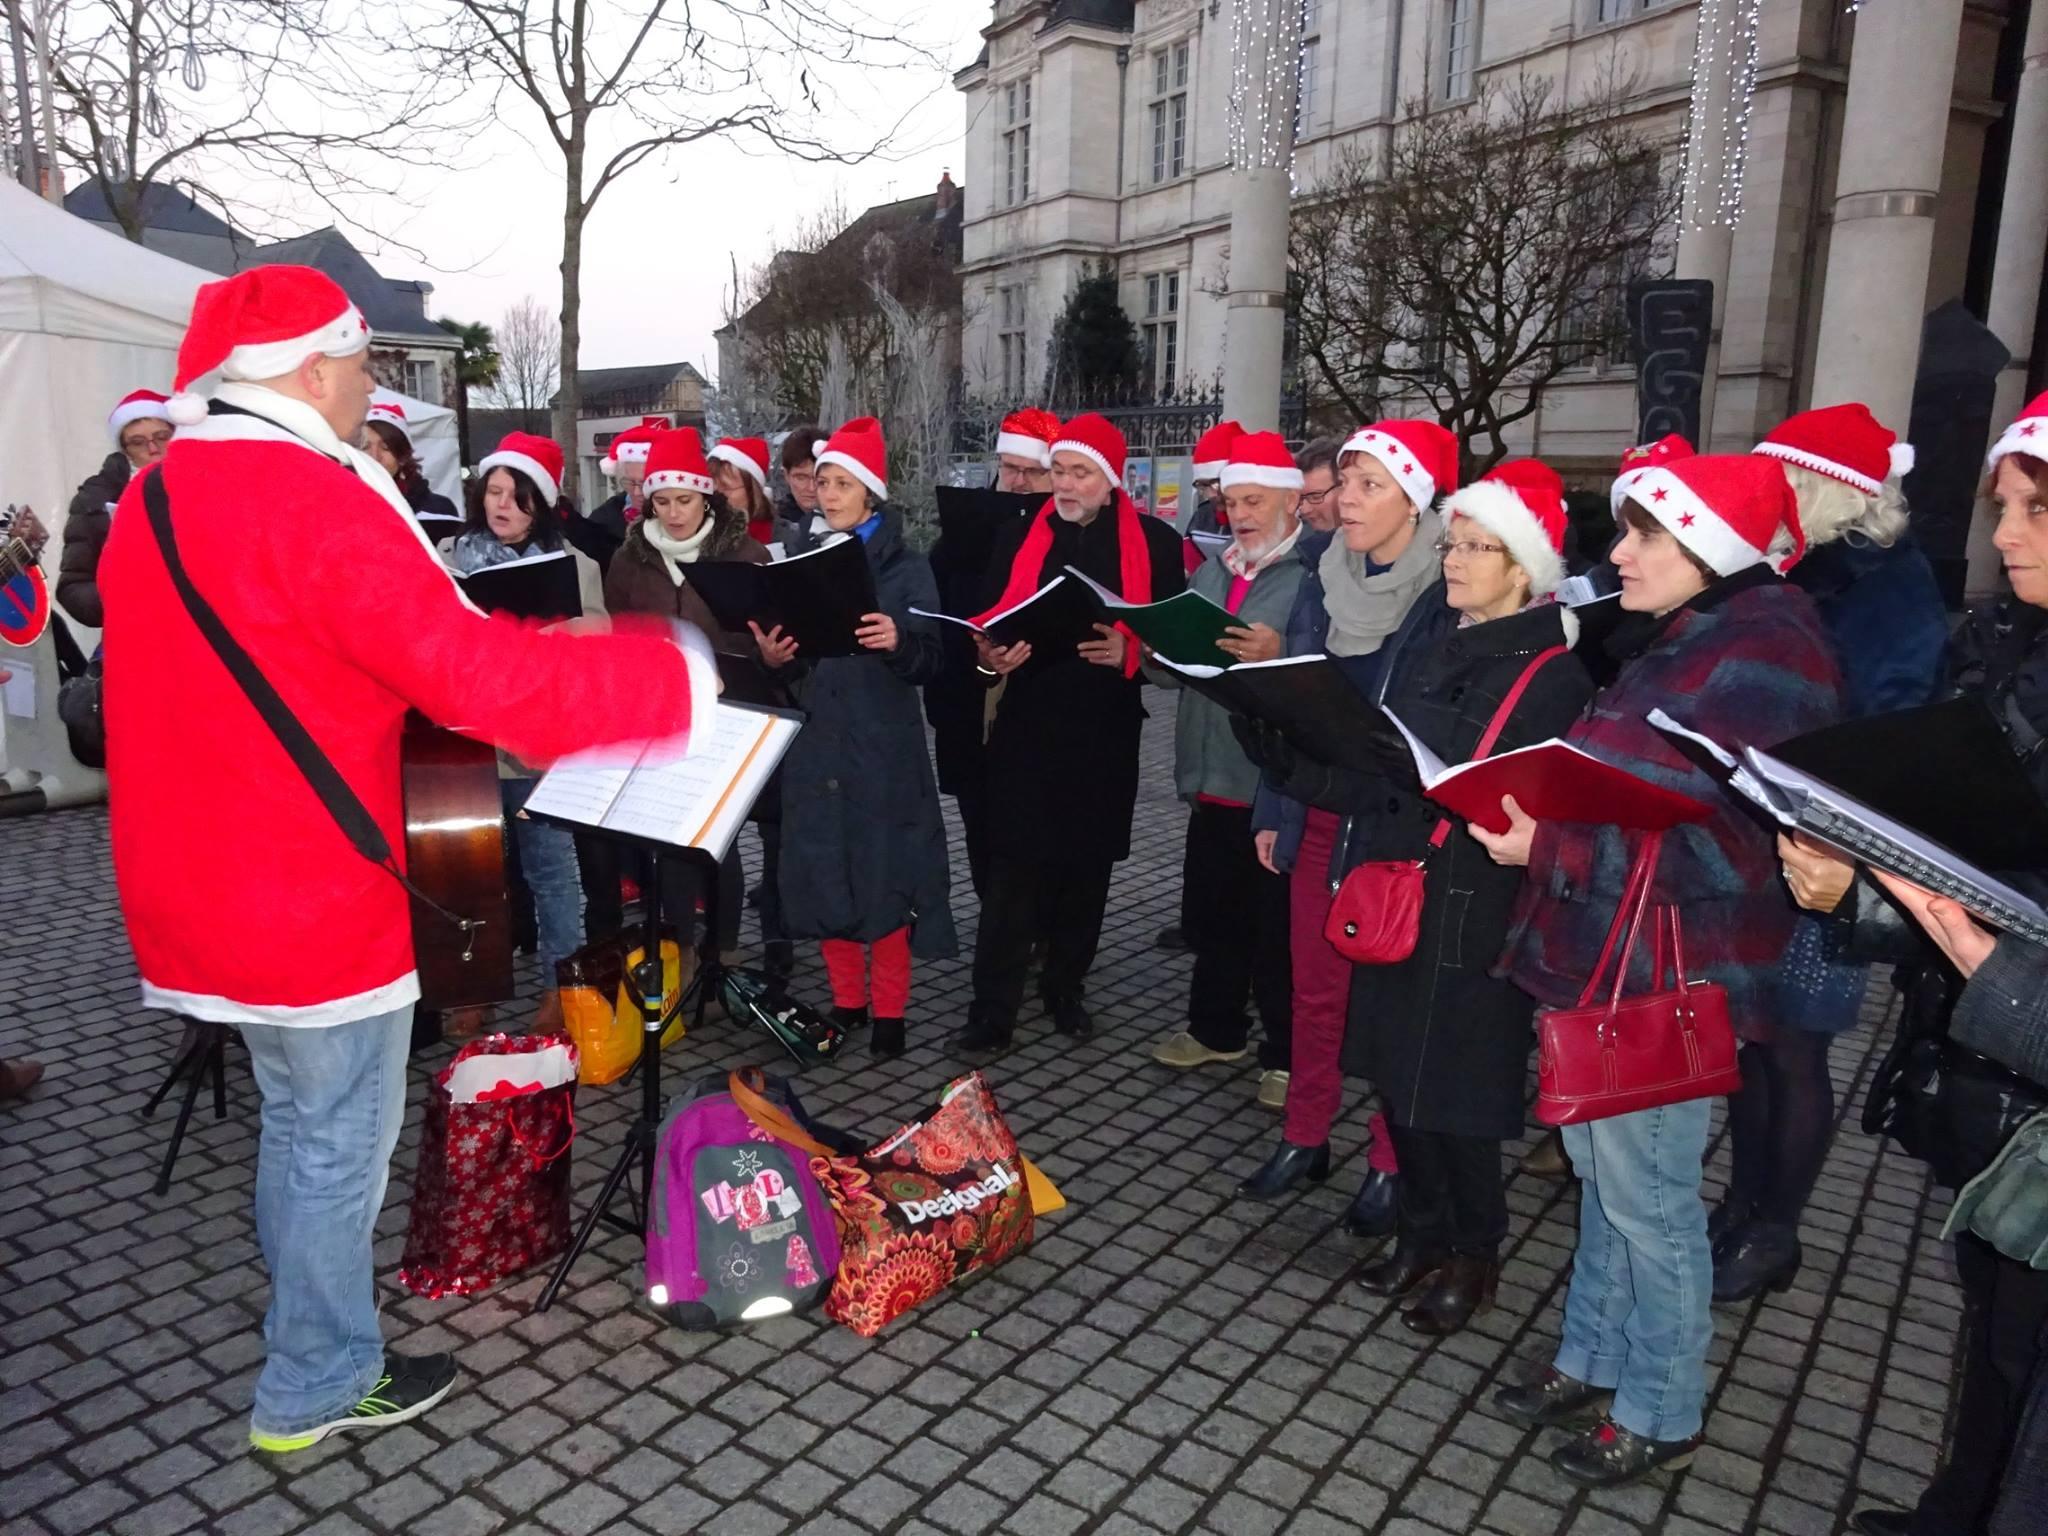 2015-12-12 – Au marché de Noël (12) Sabrina